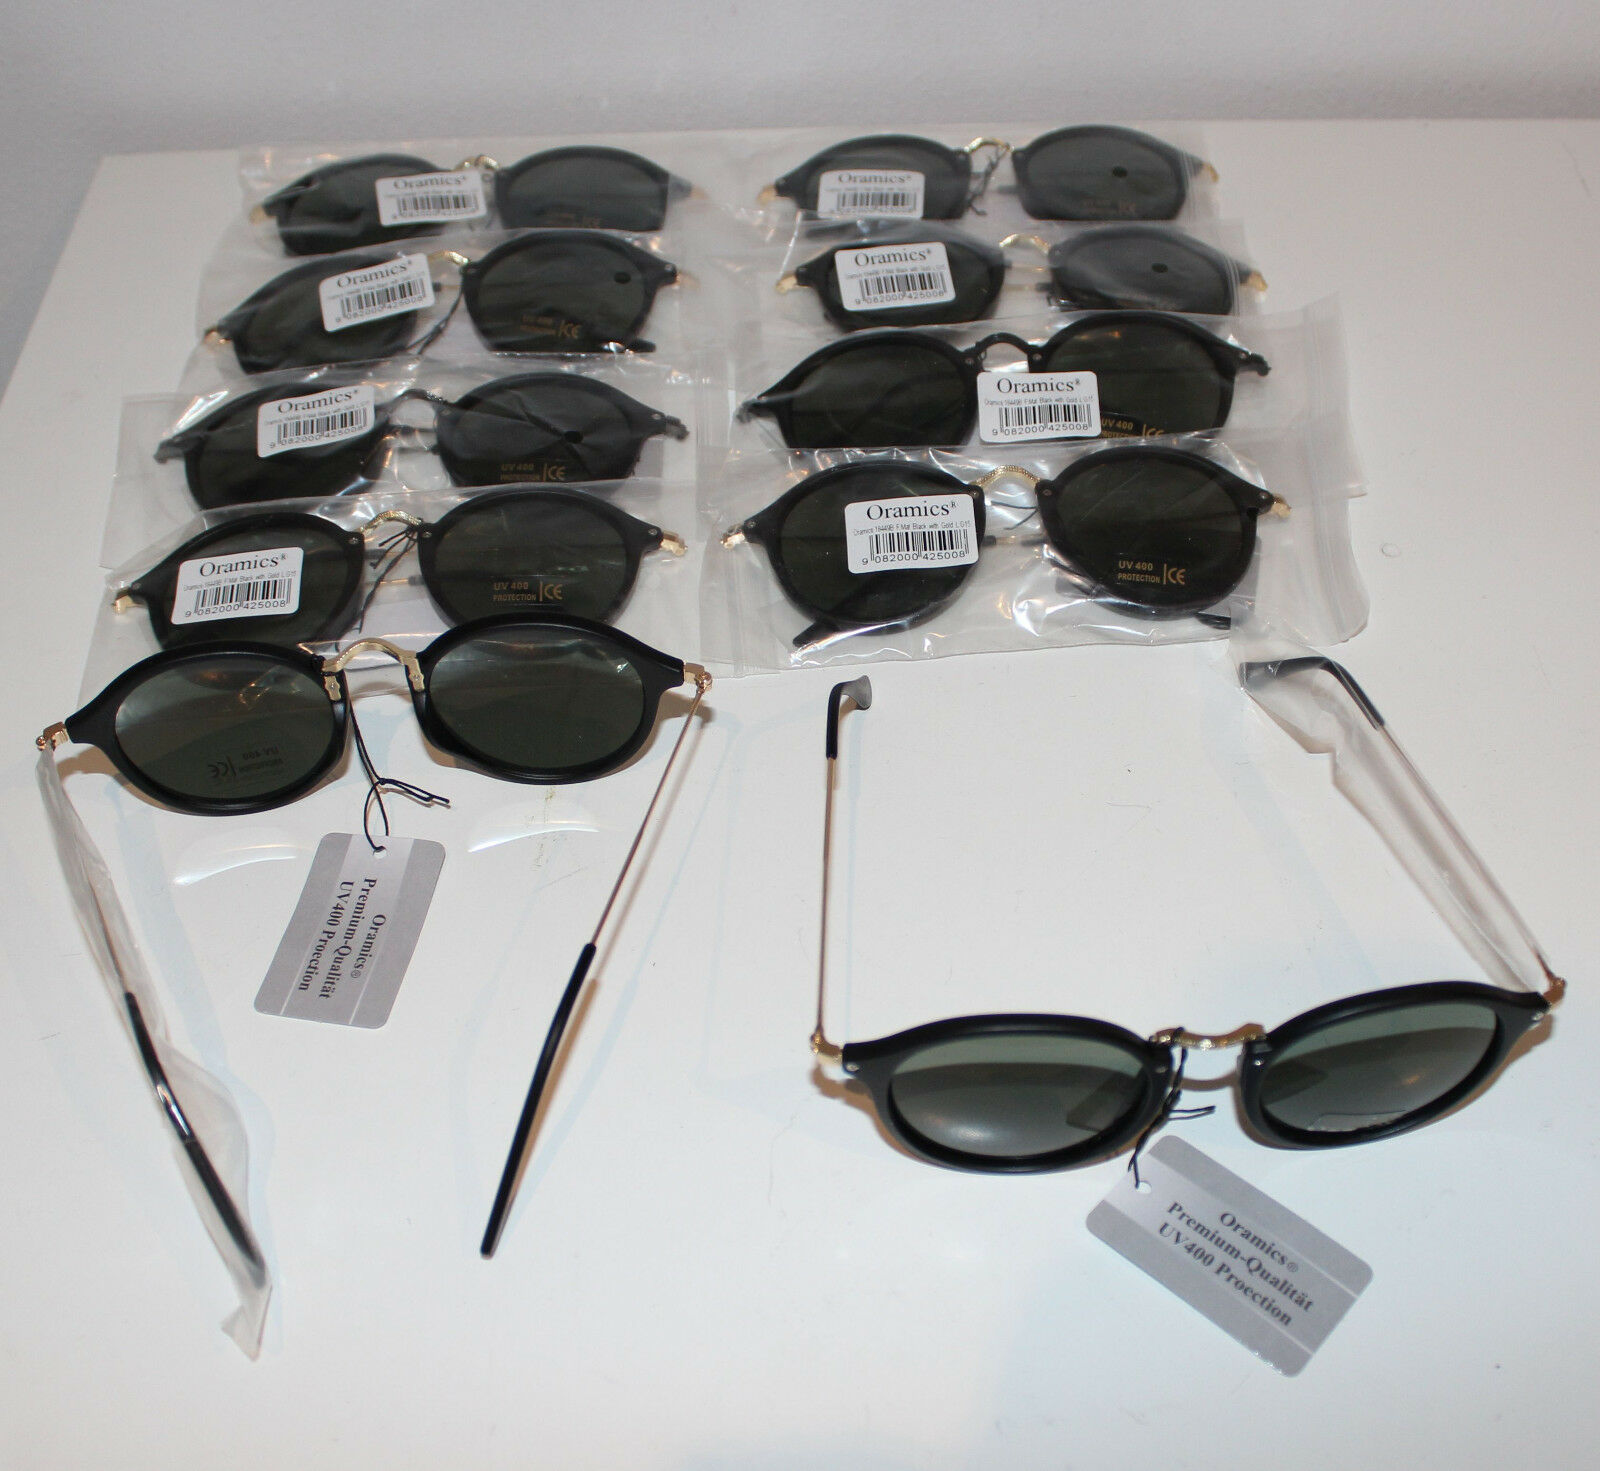 10 x Oramics Sonnenbrille Black wie abgebildet UV 400 Protection NEU